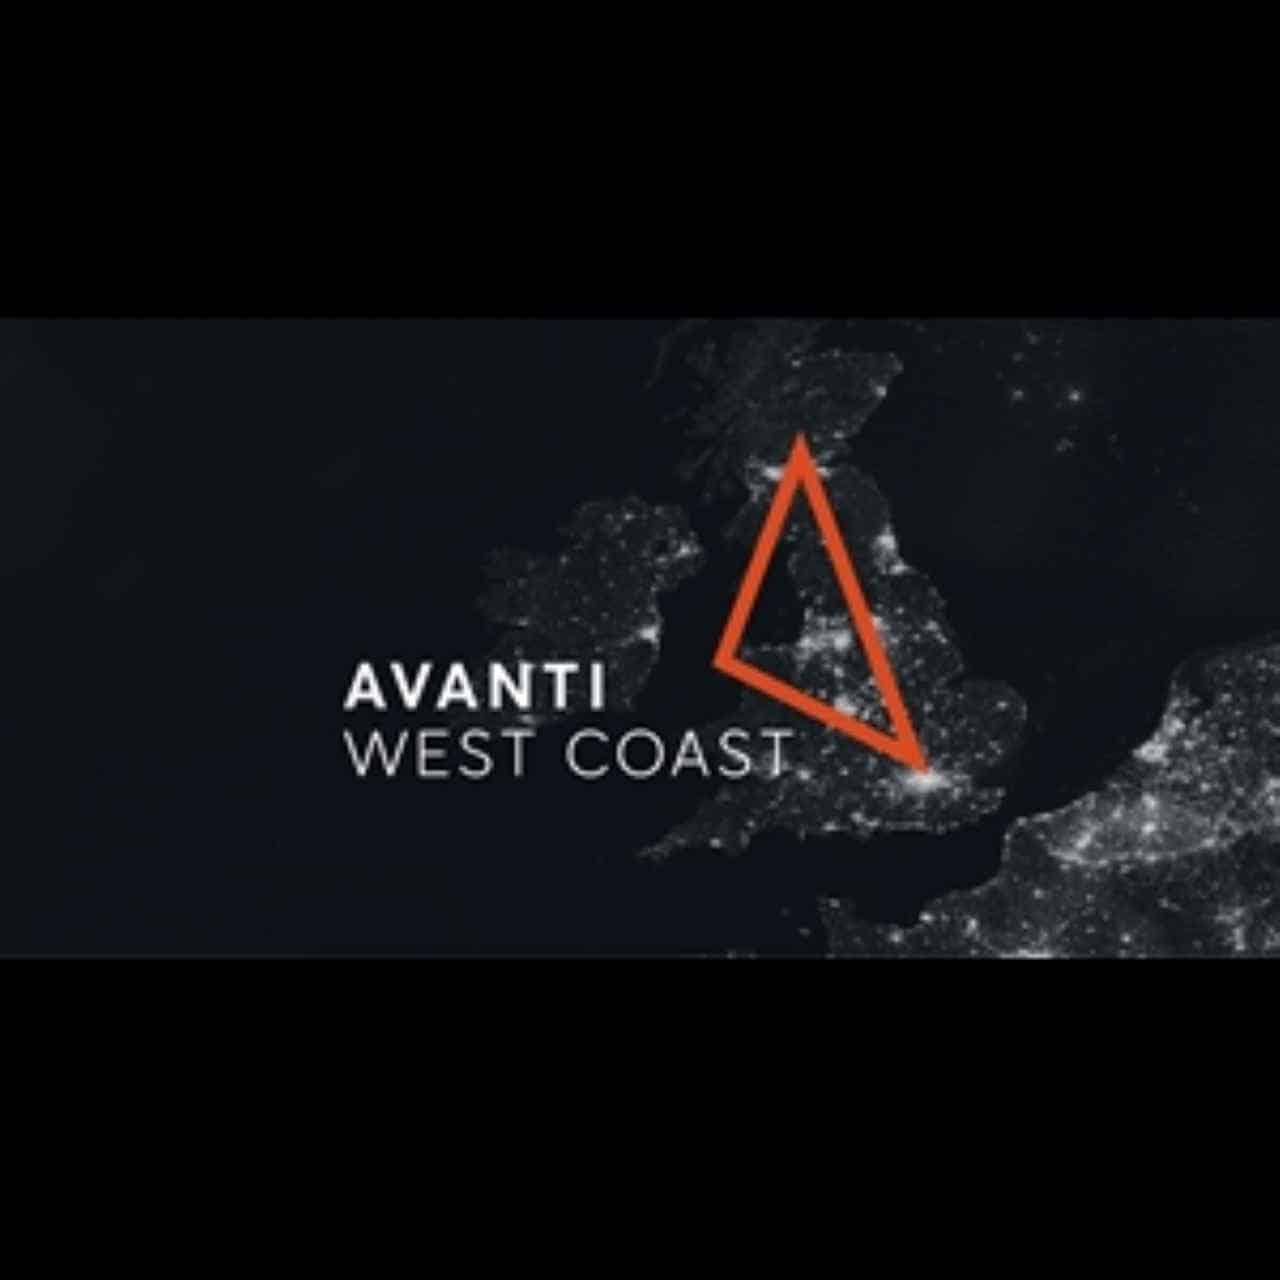 Avanti West Coast